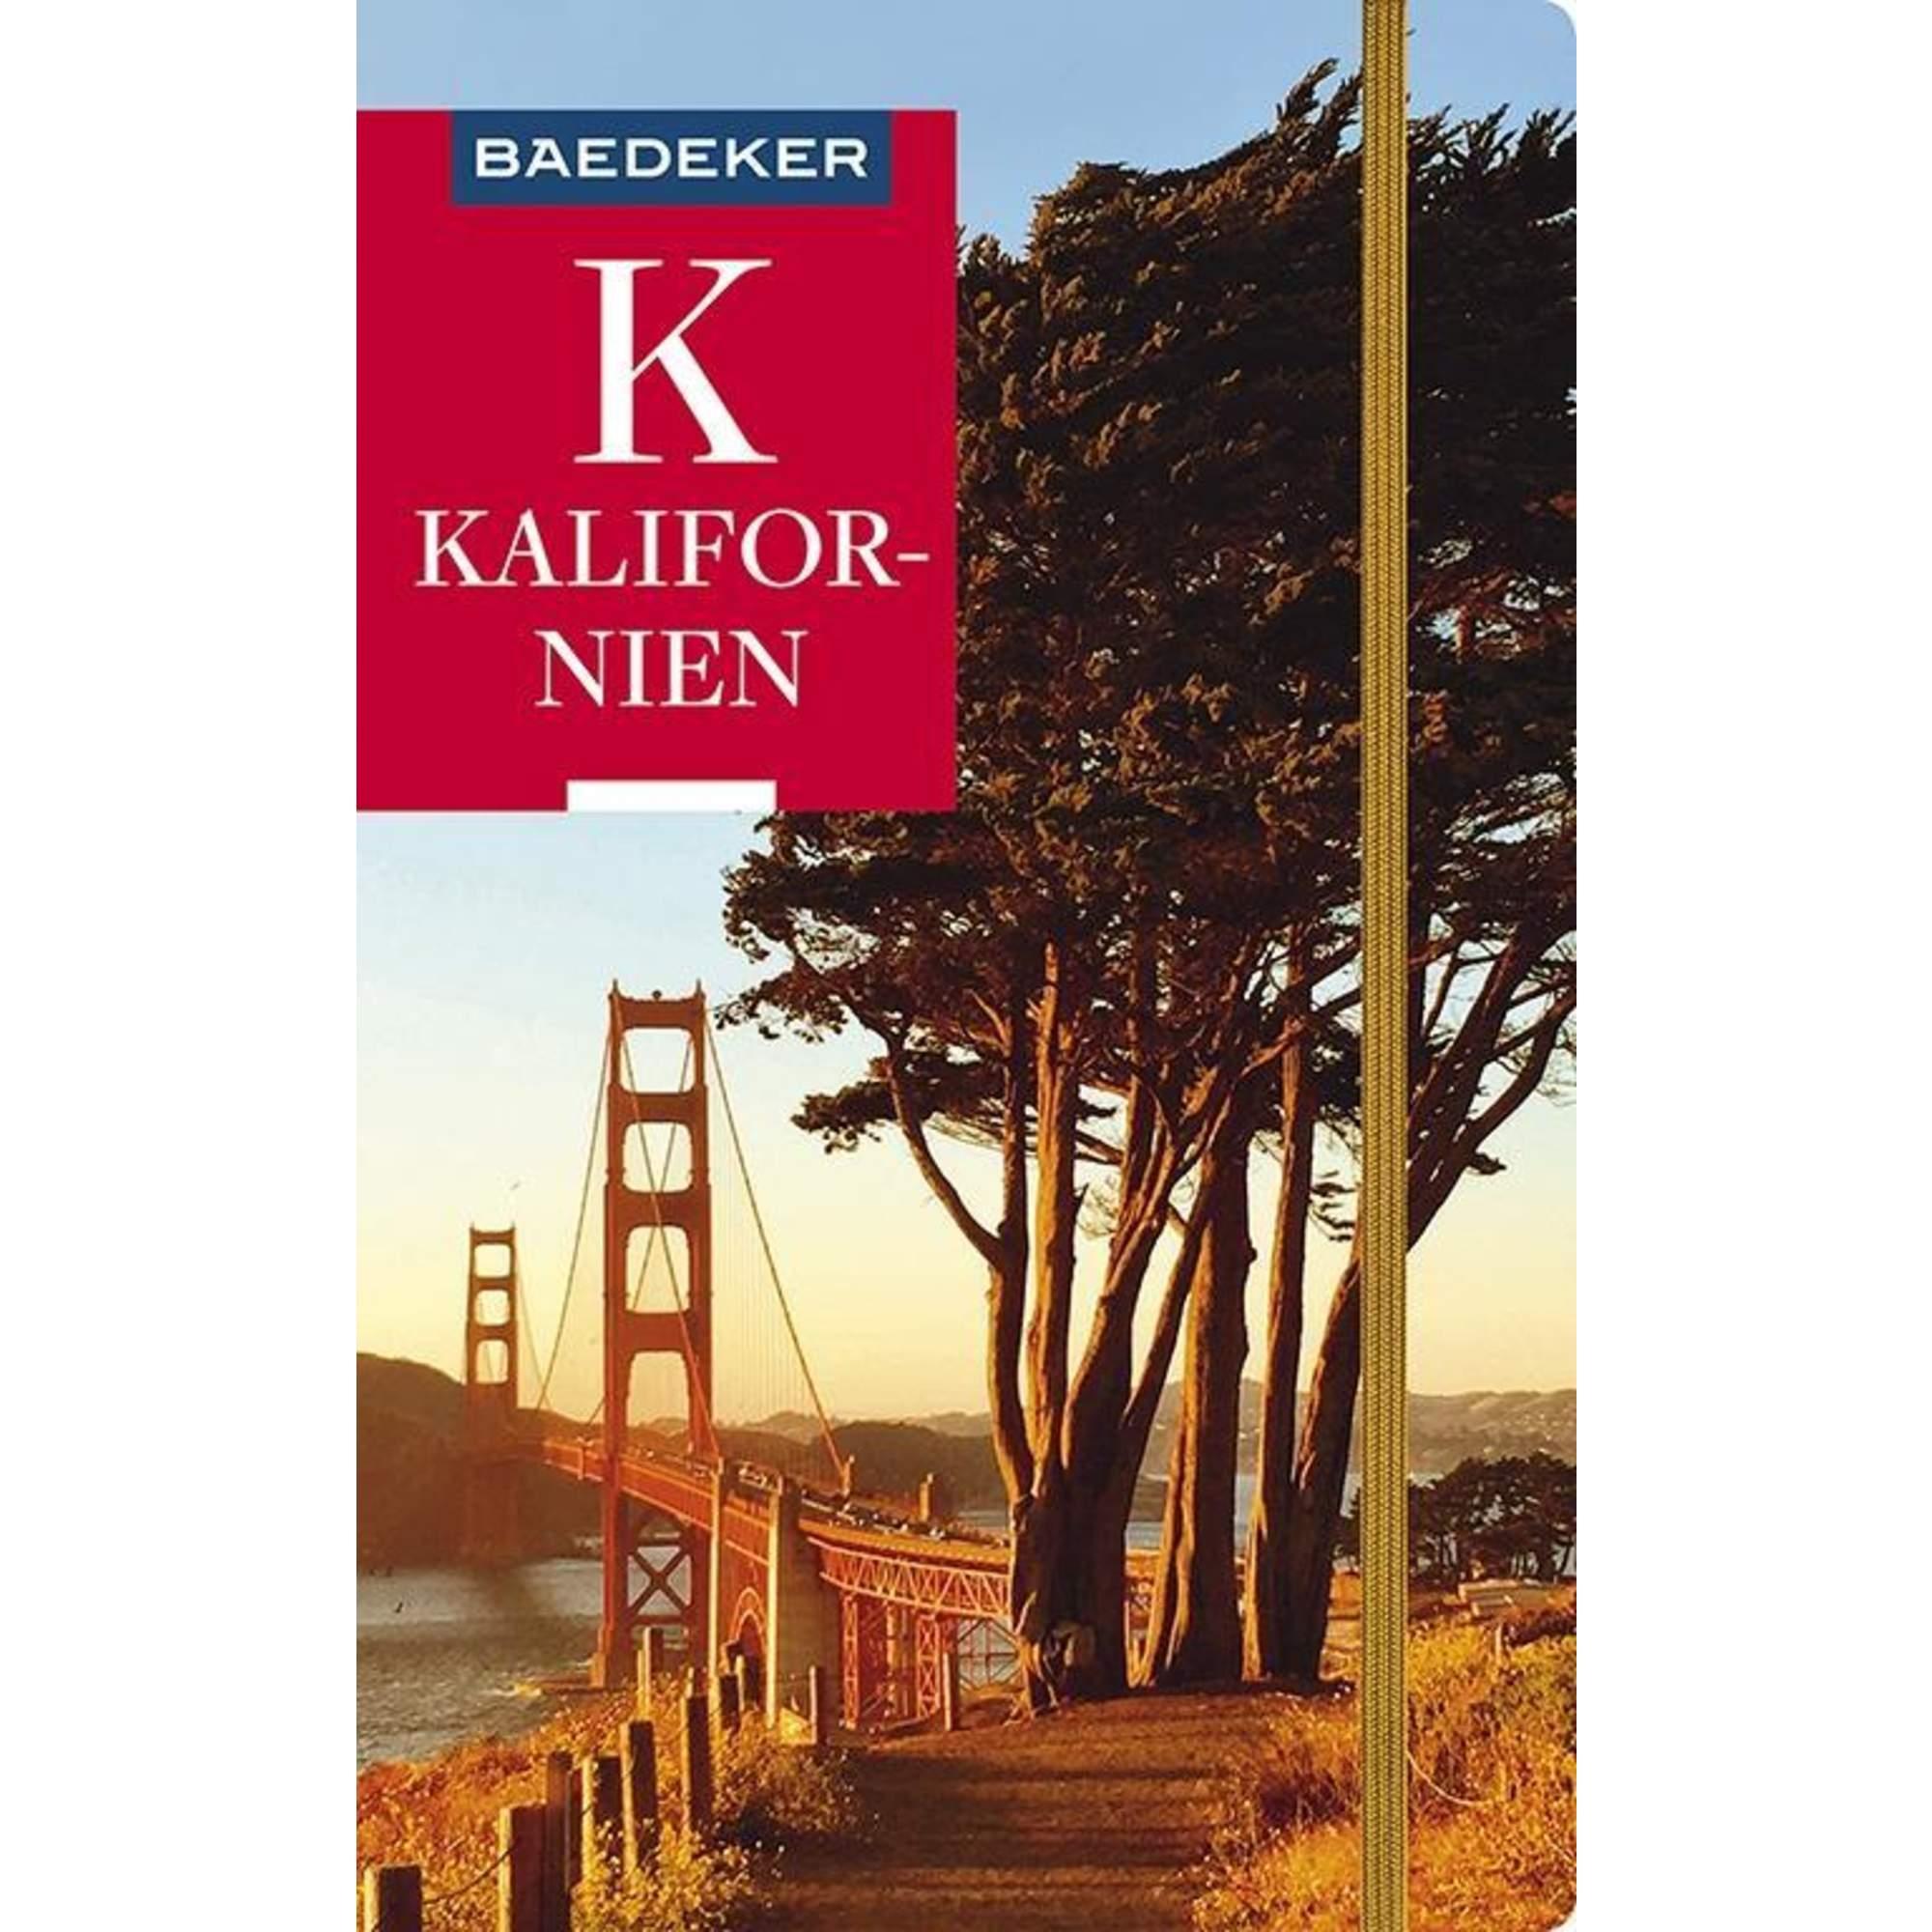 Baedeker Reiseführer Kalifornien, 24,99 Euro